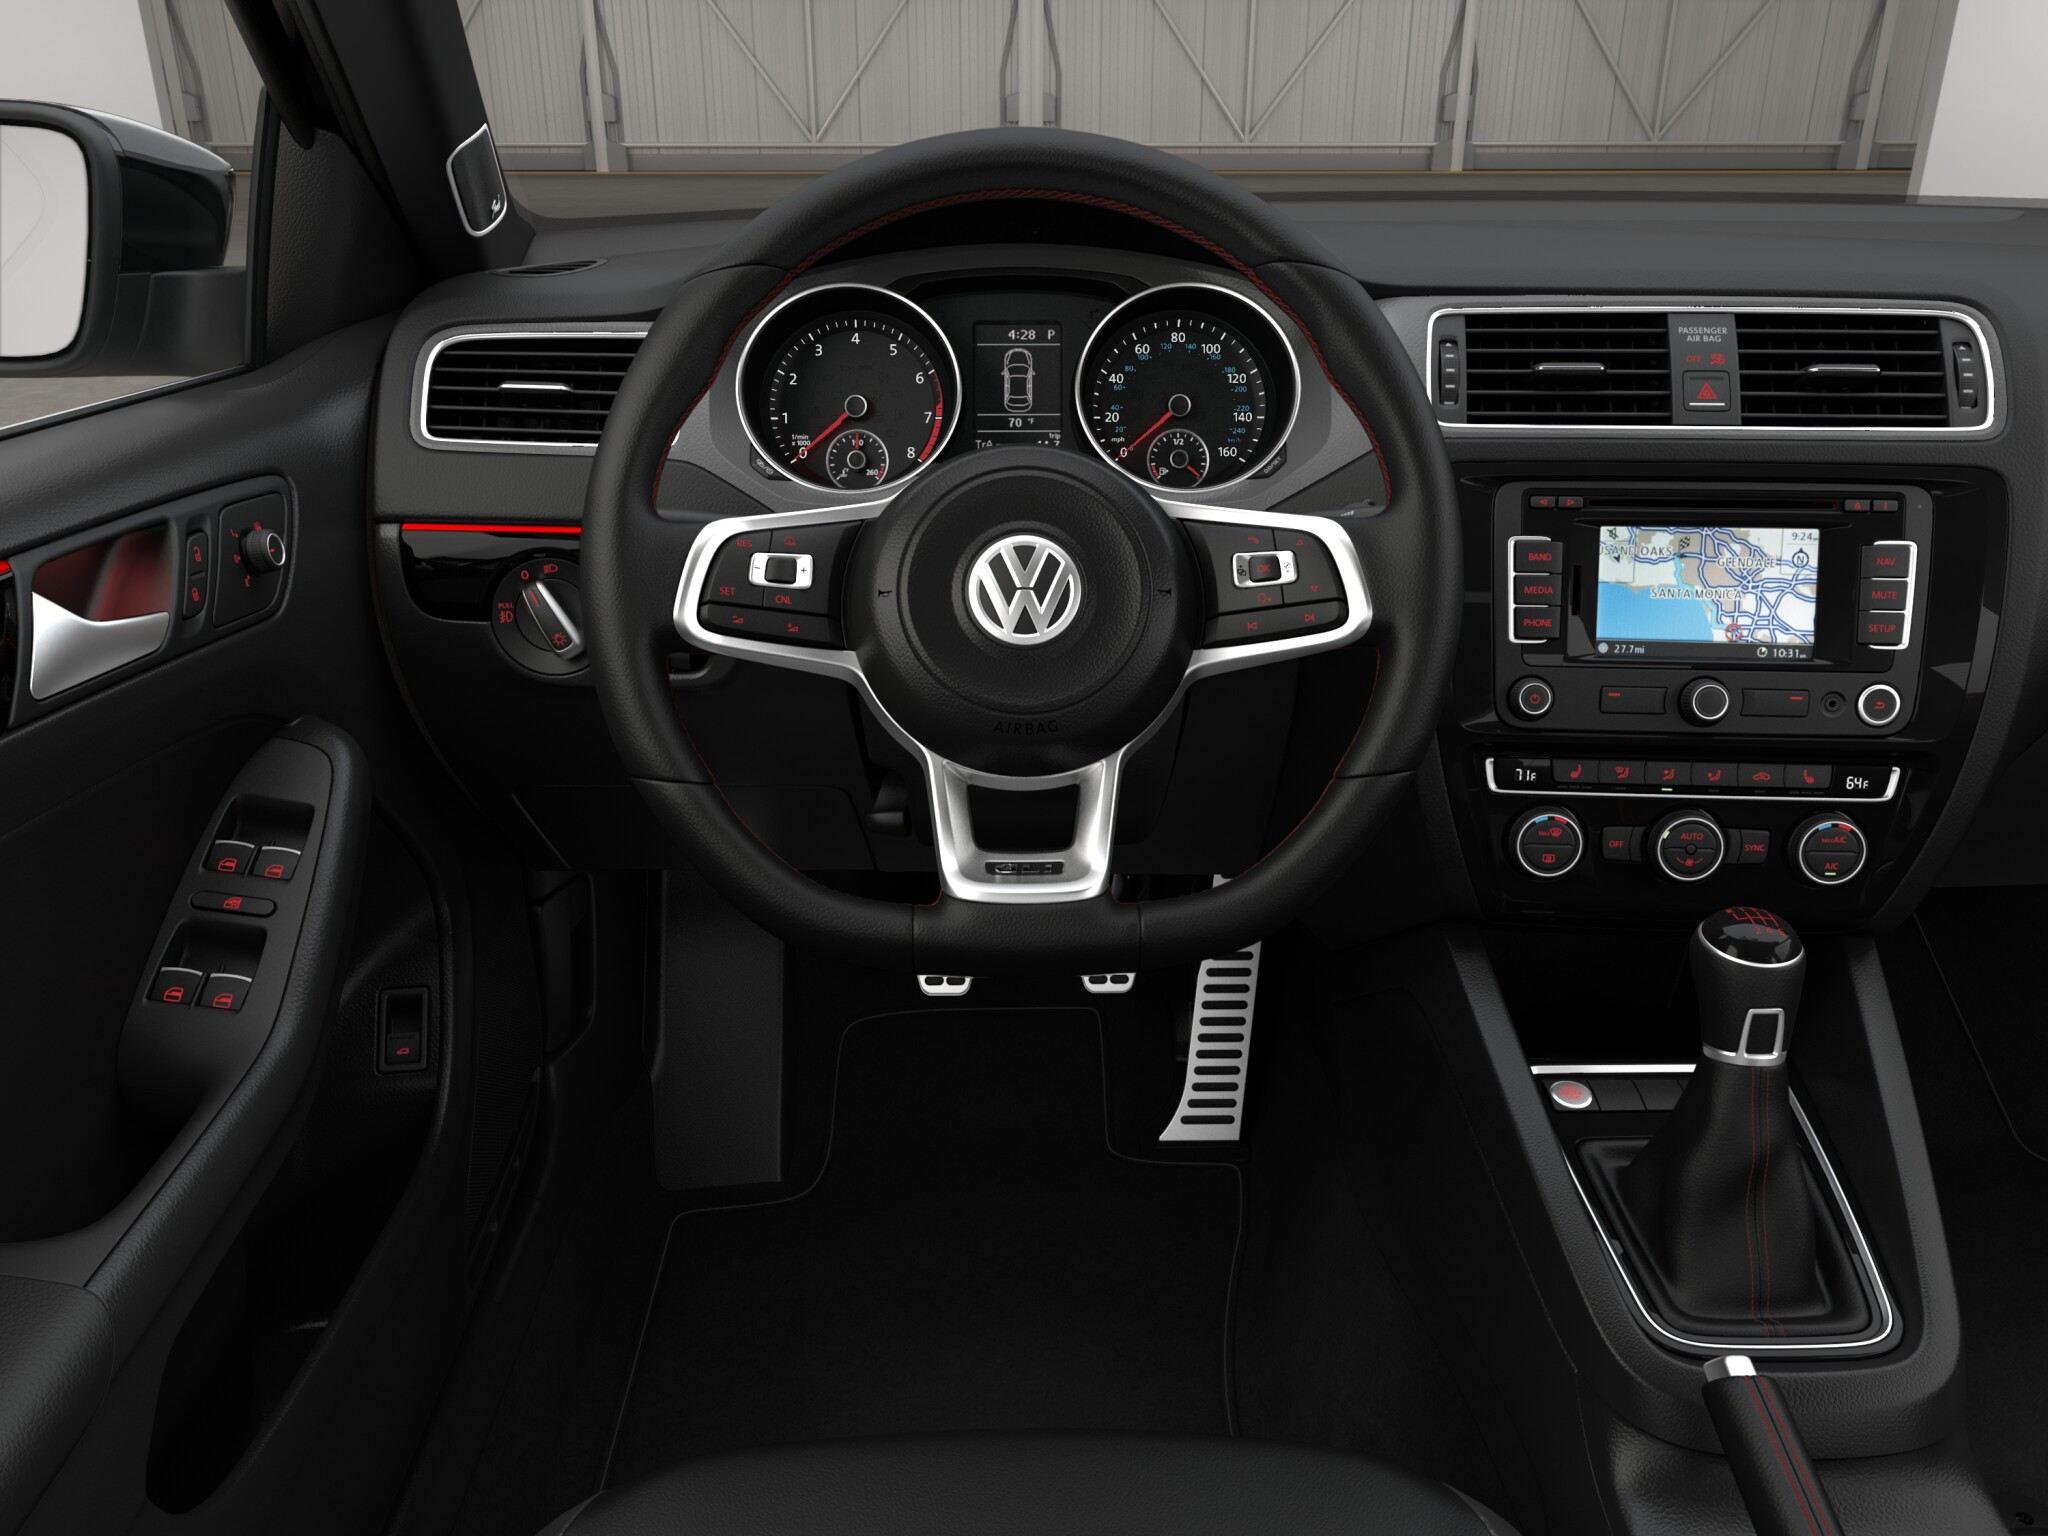 Audi a1 price saudi arabia